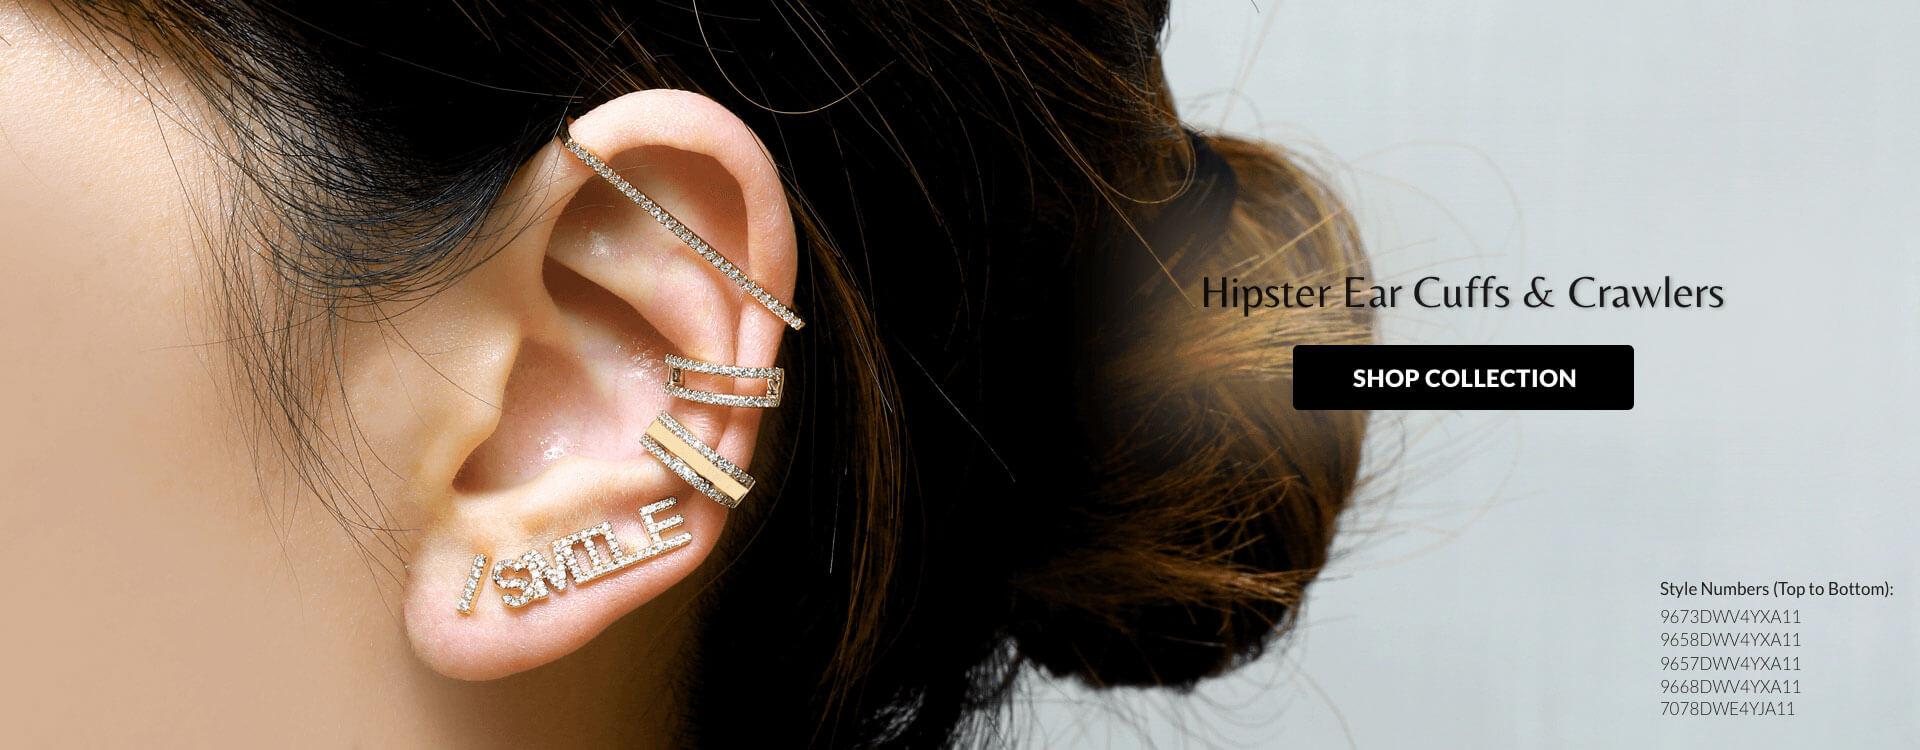 HIpster Ear Cuff & Crawlers